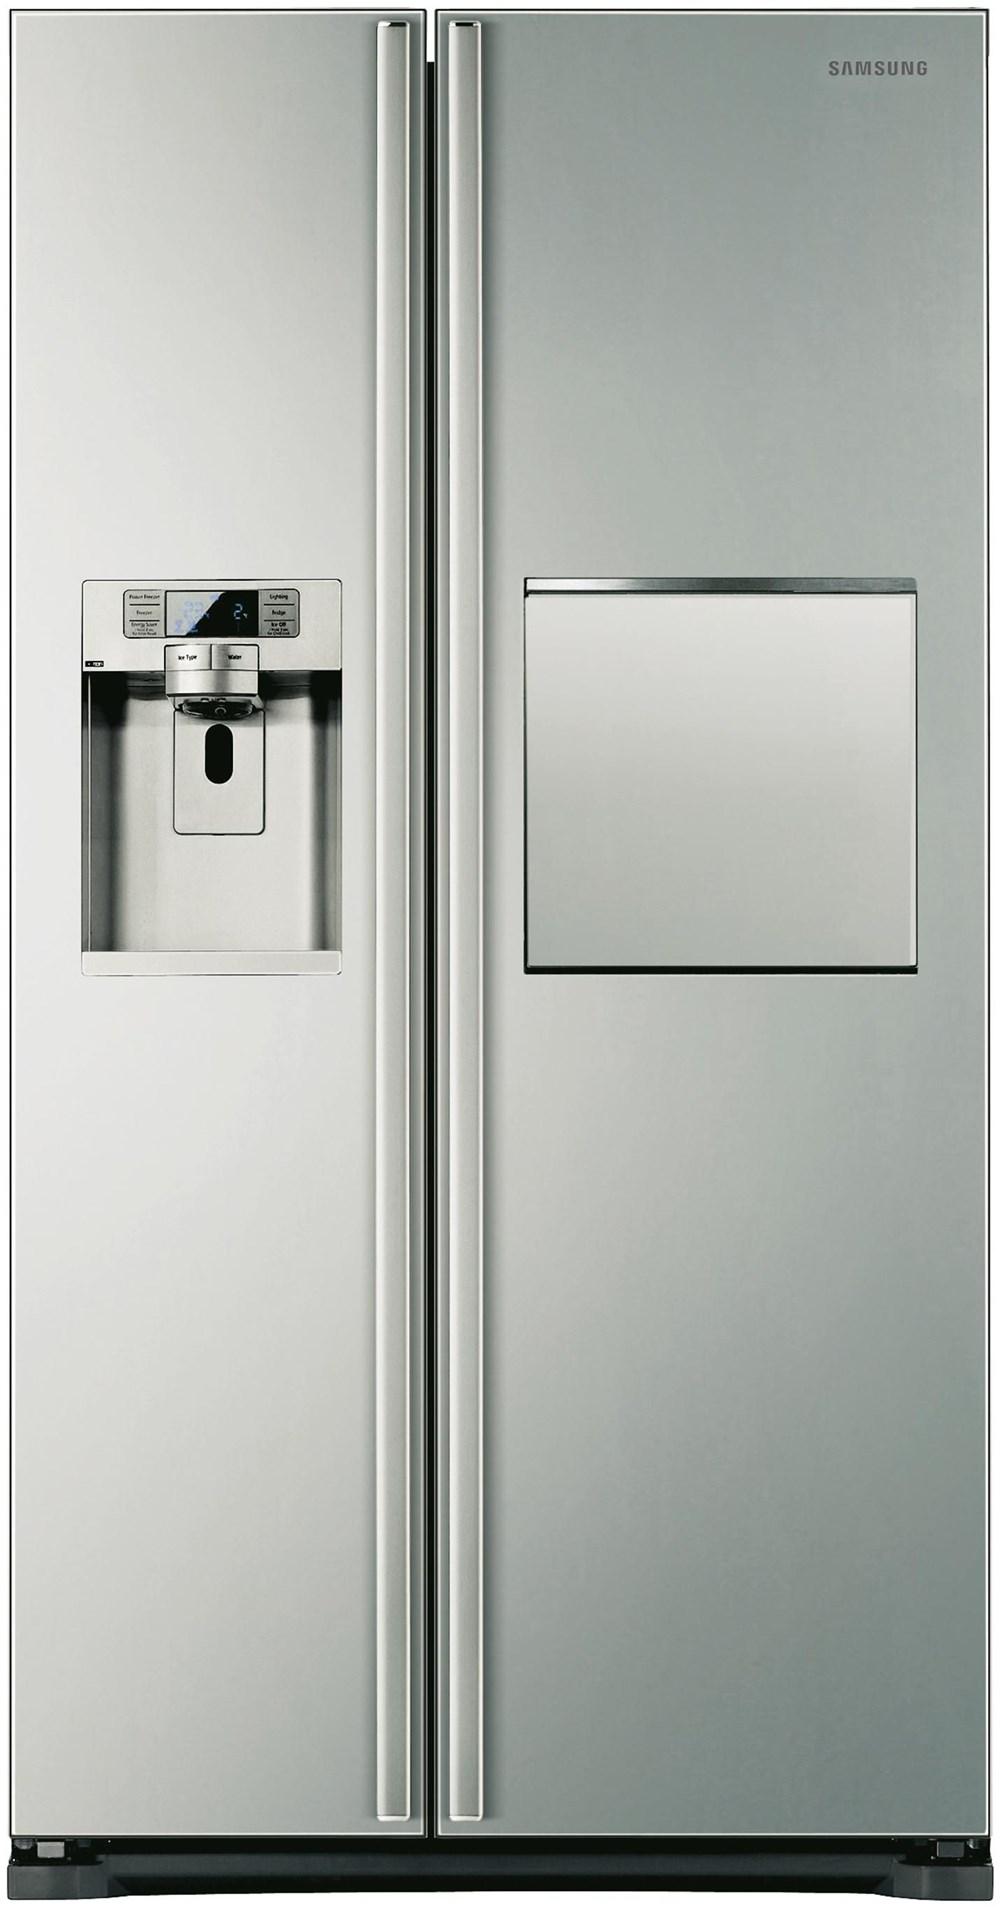 Kühlschrank Cool Cool Samsung No Frost N Ruiz Rose Blog